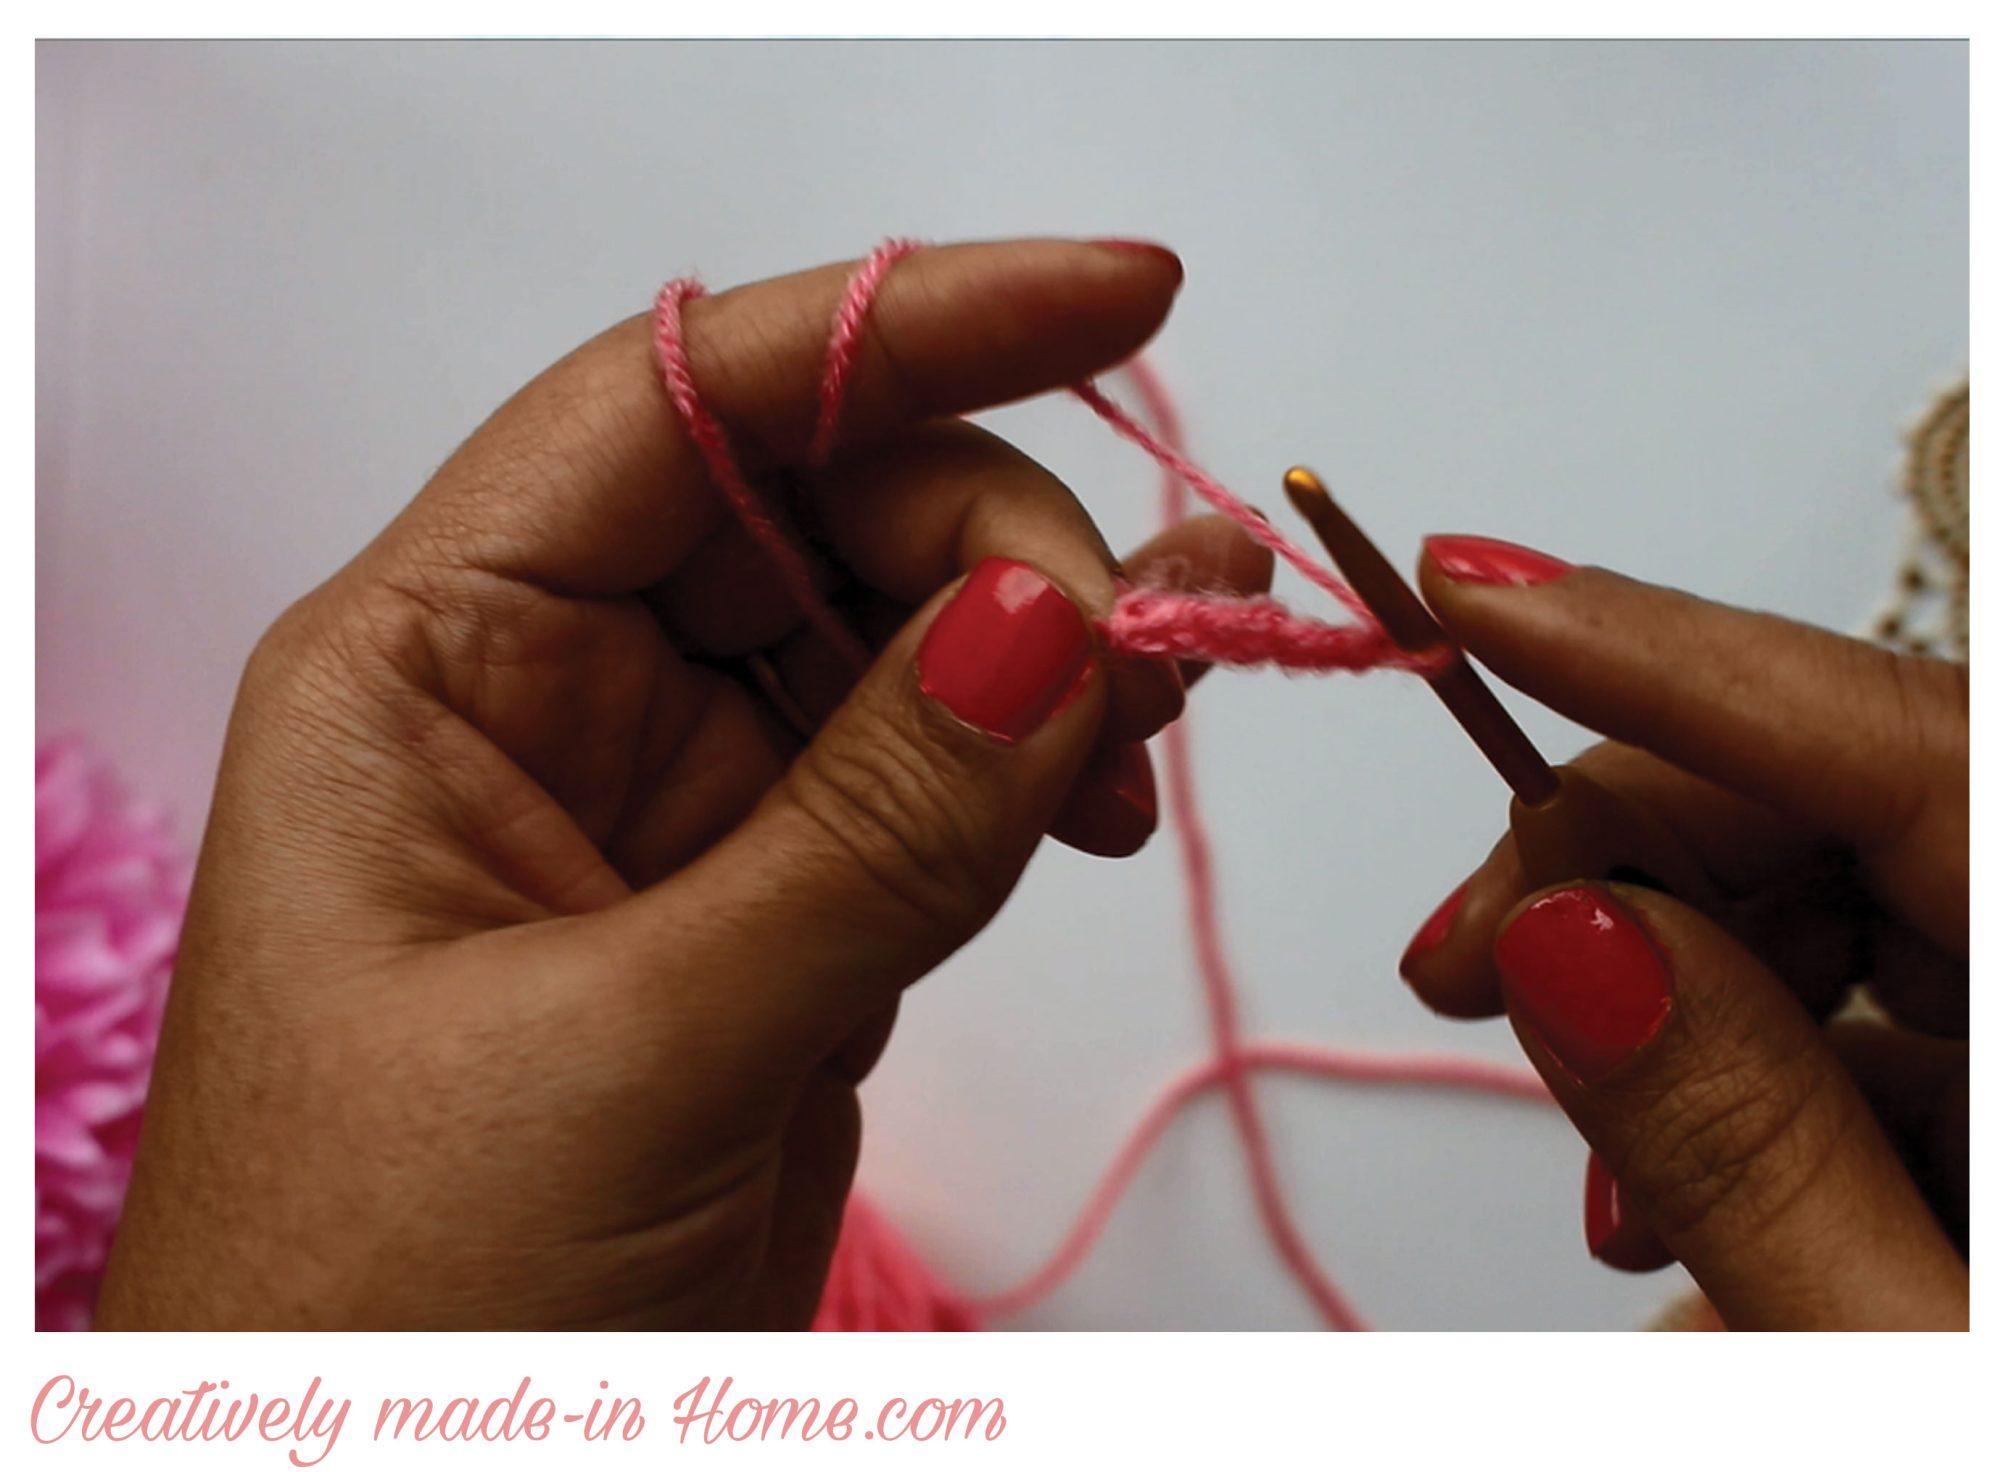 How To Make A Crochet Magic Ring - Ambassador Crochet   2030x2758